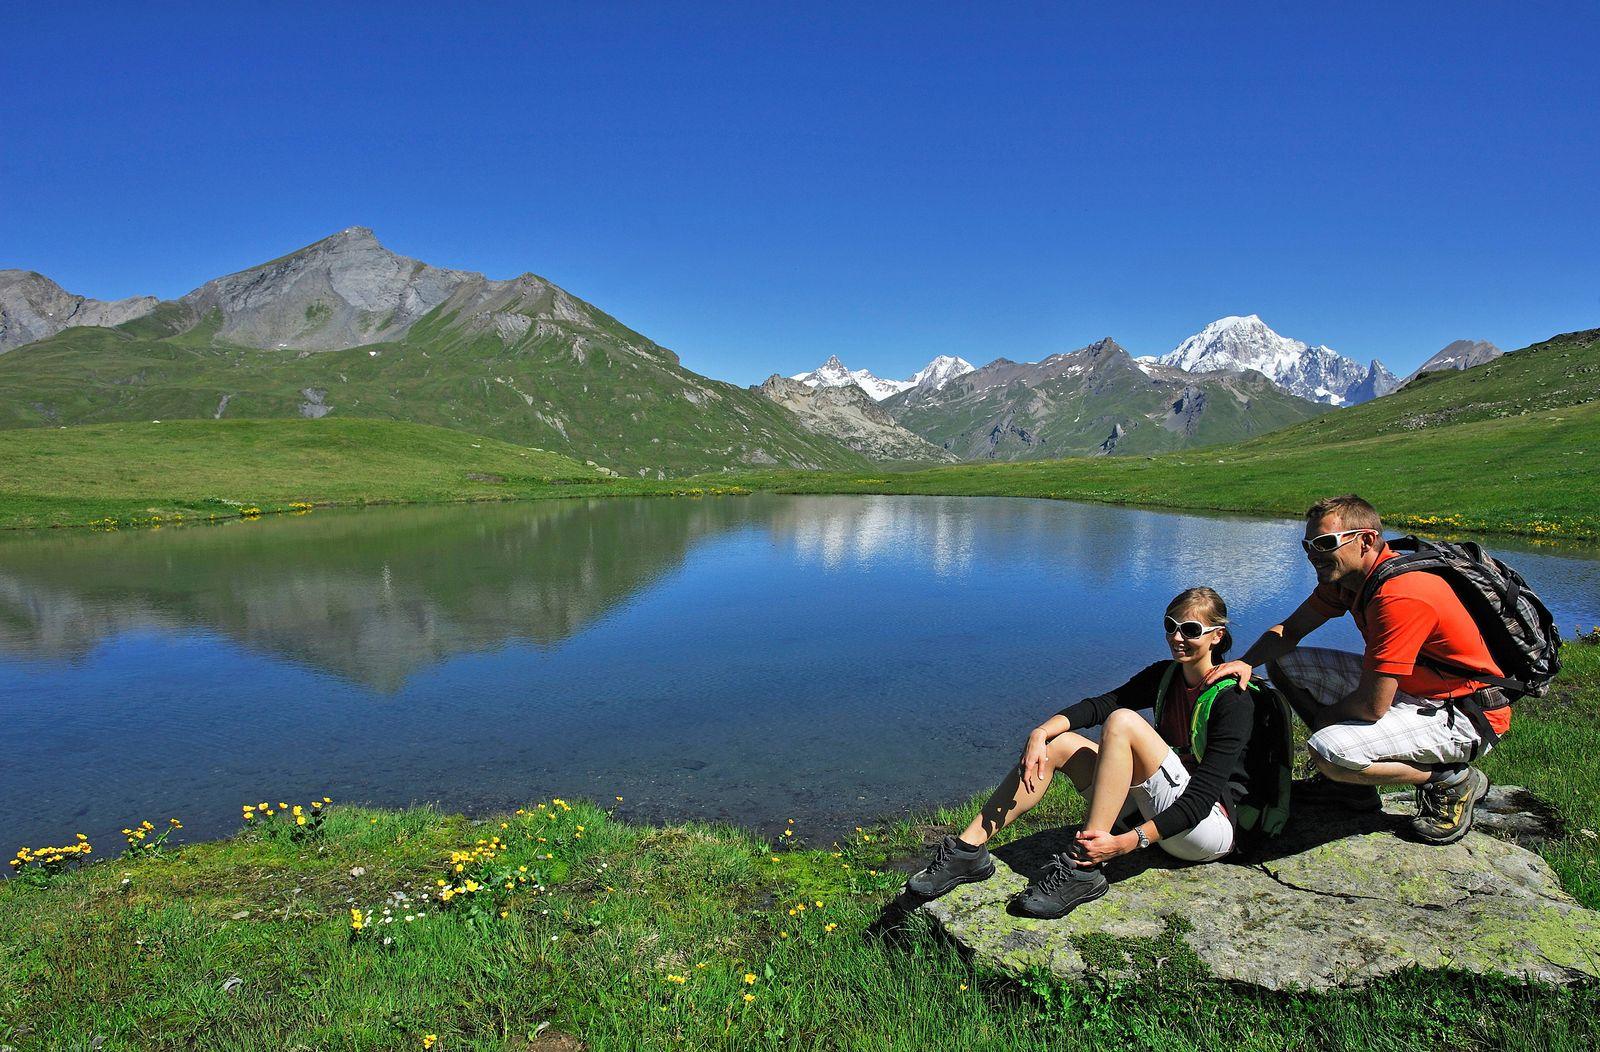 Urlaub / Wandern / Aktivurlaub